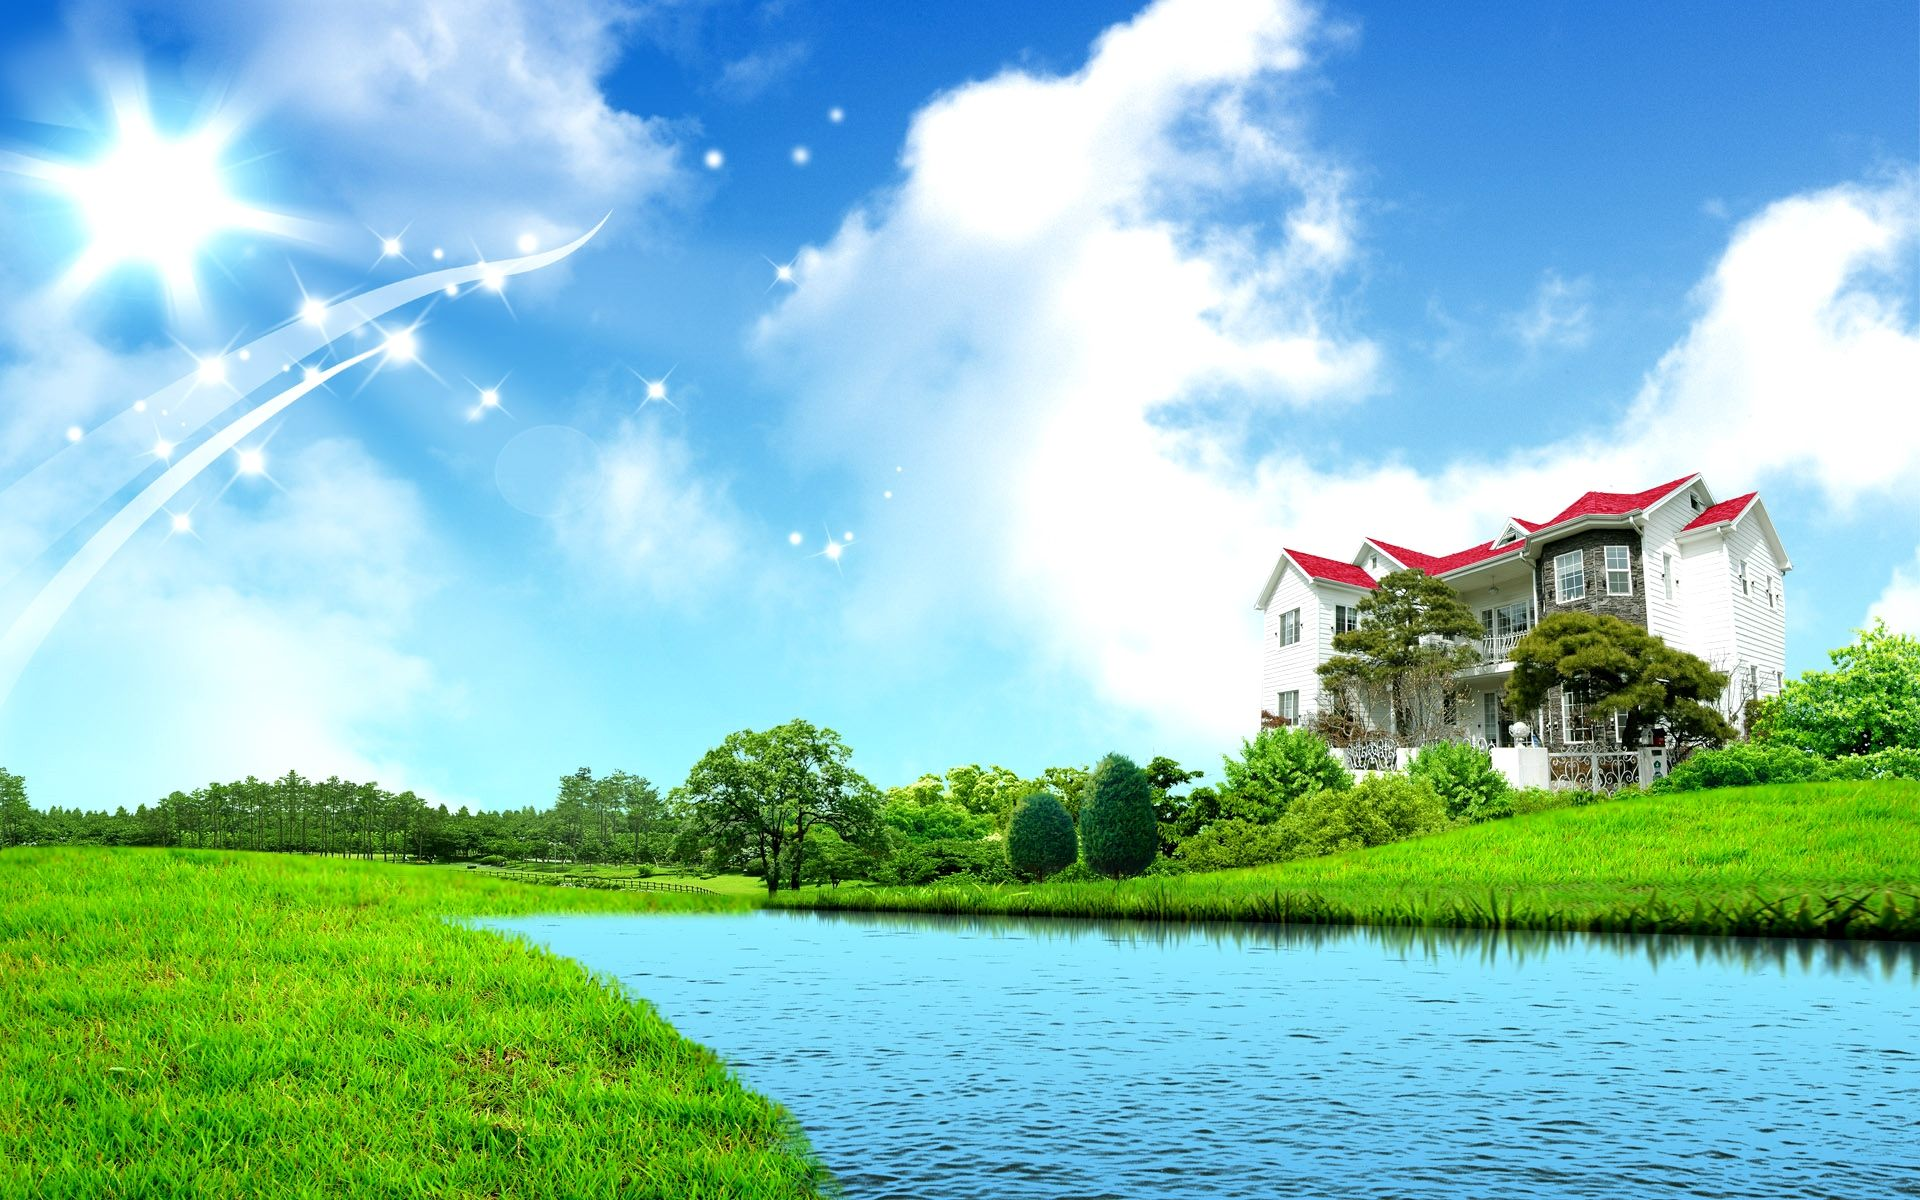 4k Wallpaper Nature House Trick Di 2020 Qur An